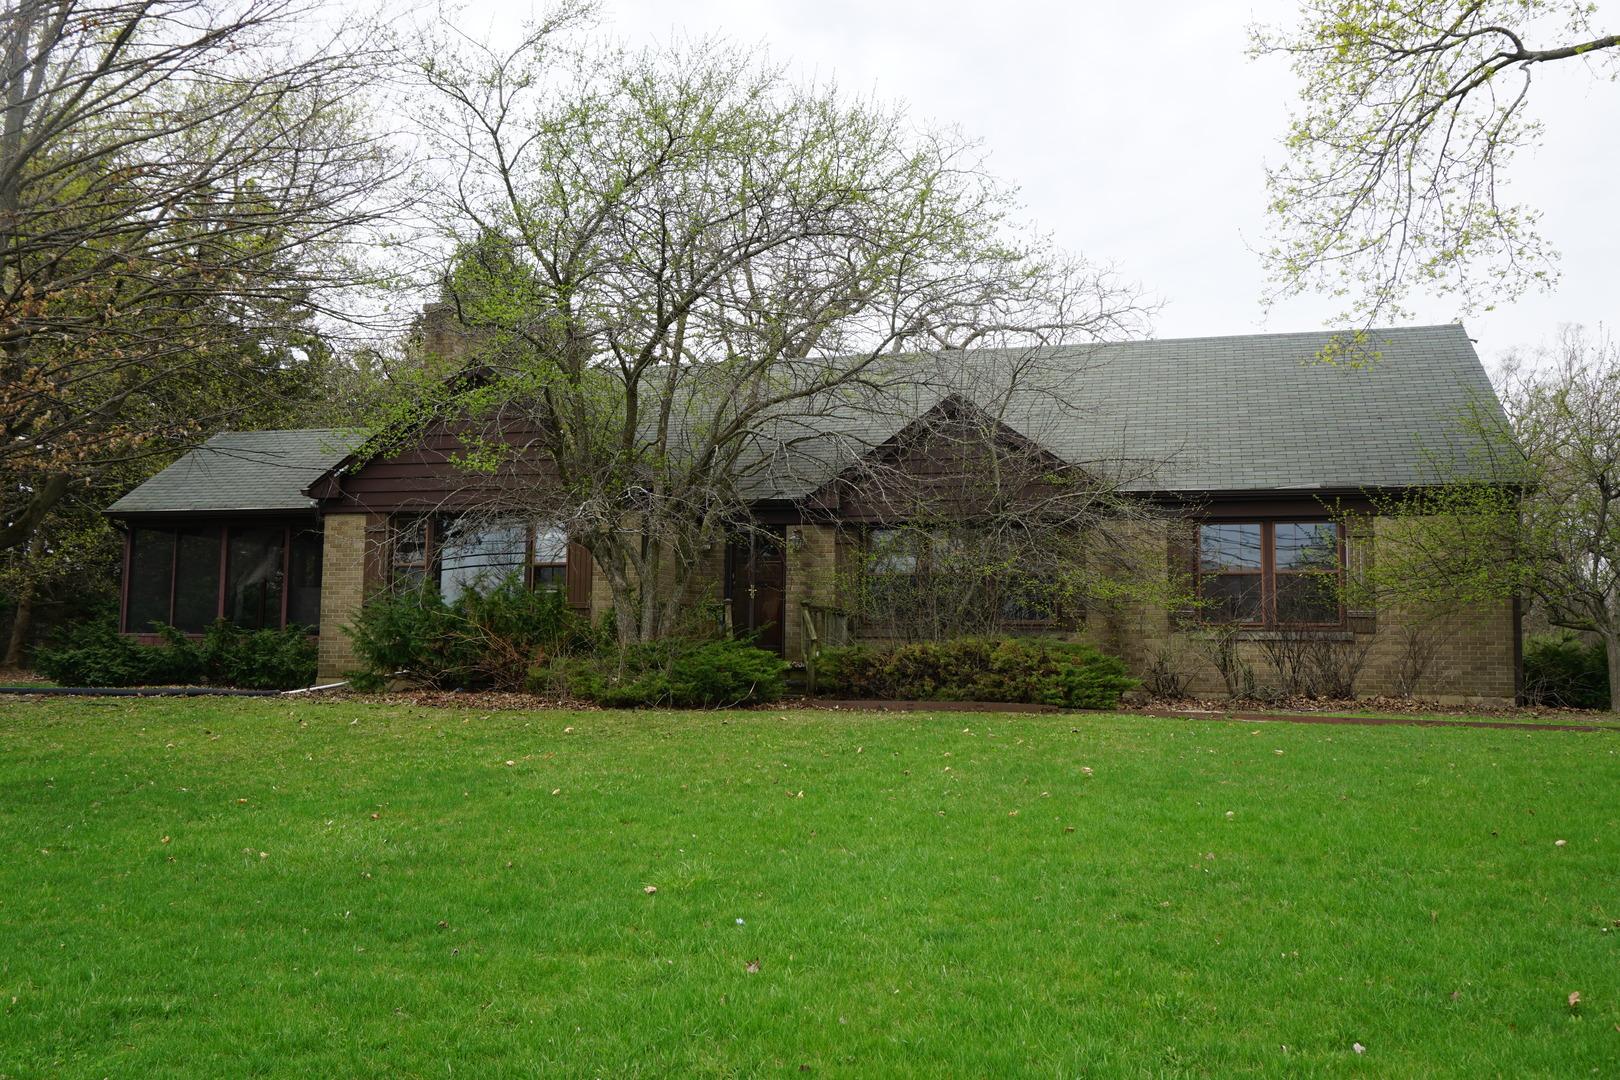 32844 North Atkinson, Grayslake, Illinois, 60030